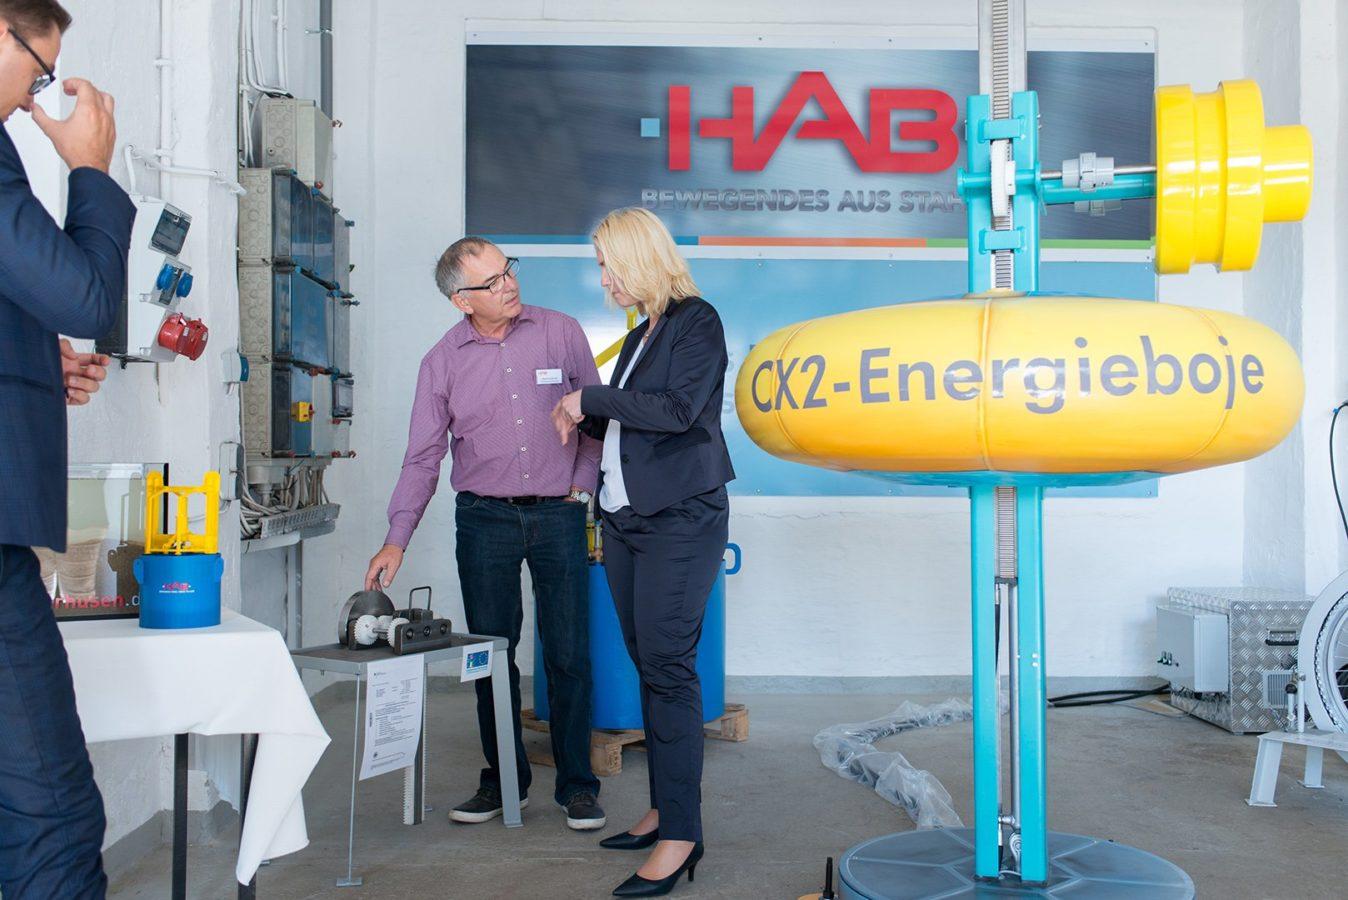 Landespräsidentin Manuela Schwesig HAB Projekt Energie